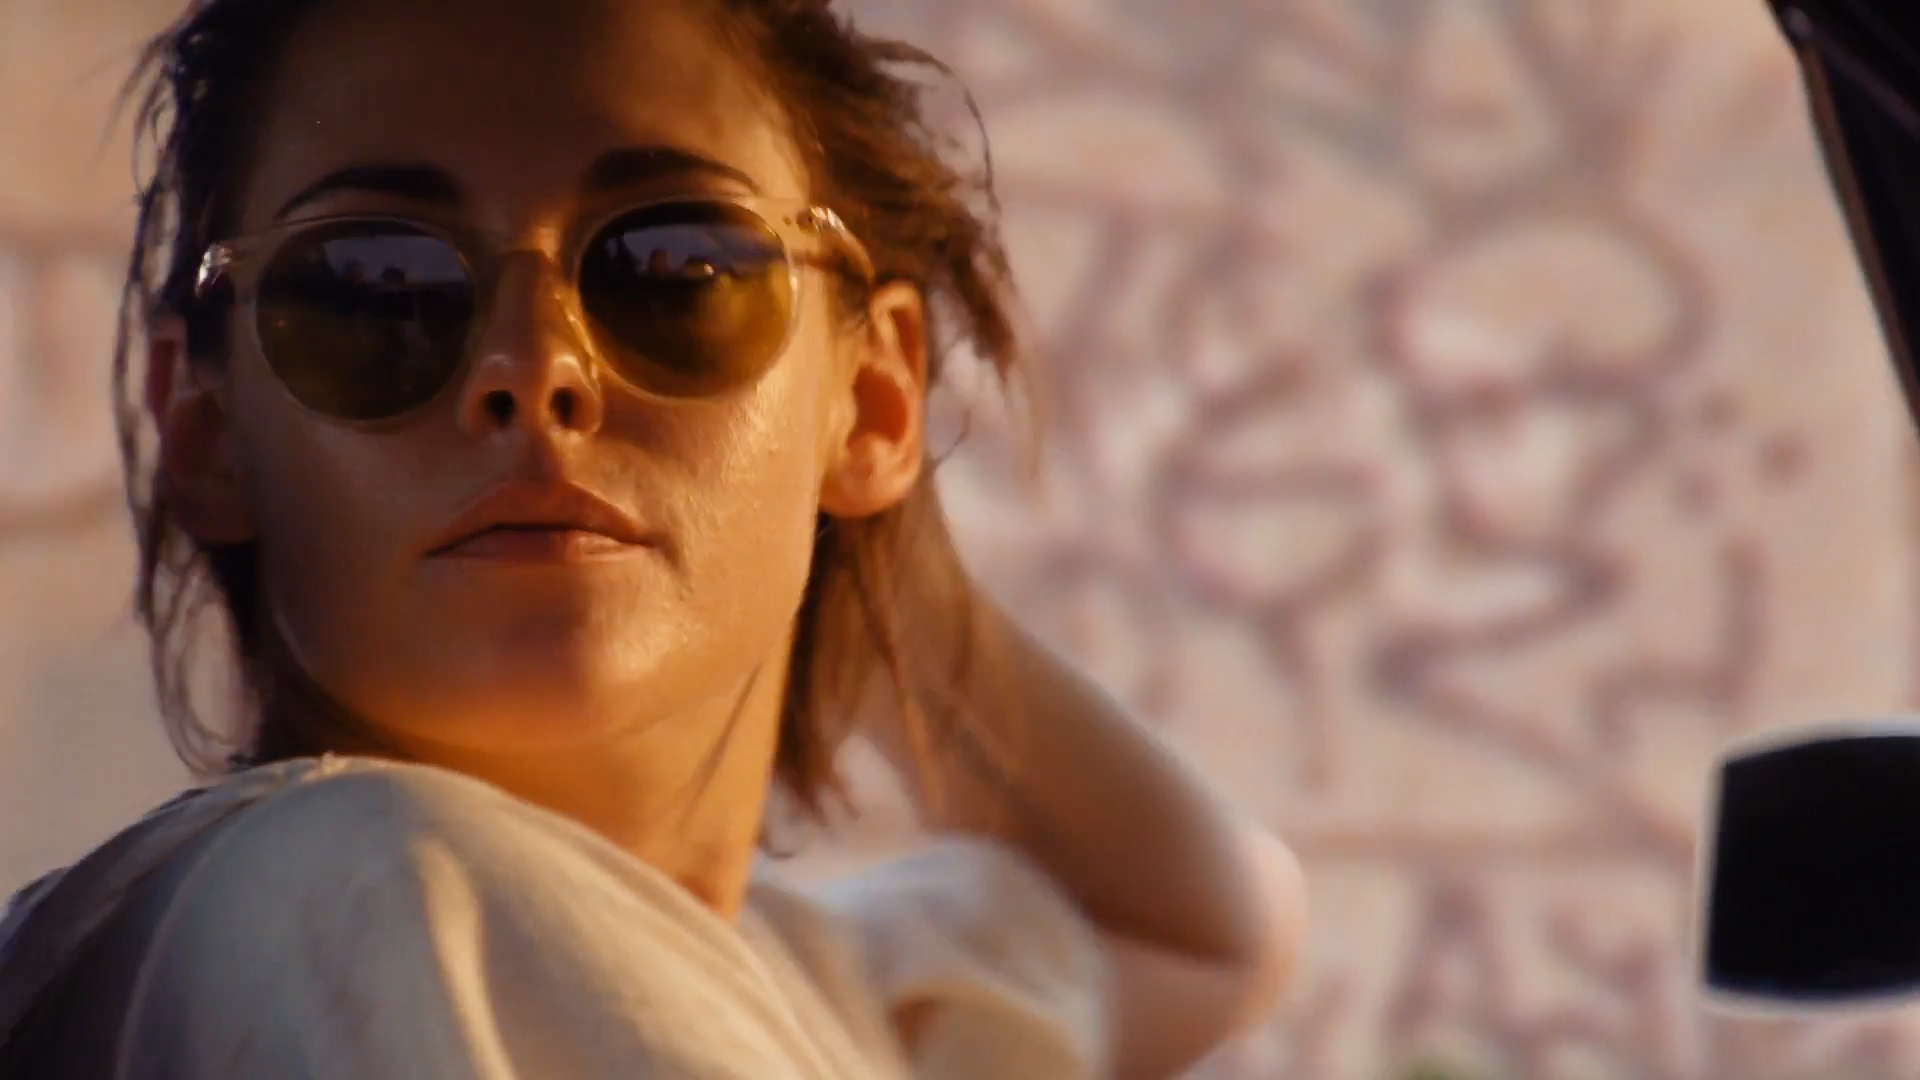 Kristen Stewart hot sexy nipple slip - The Rolling Stones - Ride 'Em On Down (1)